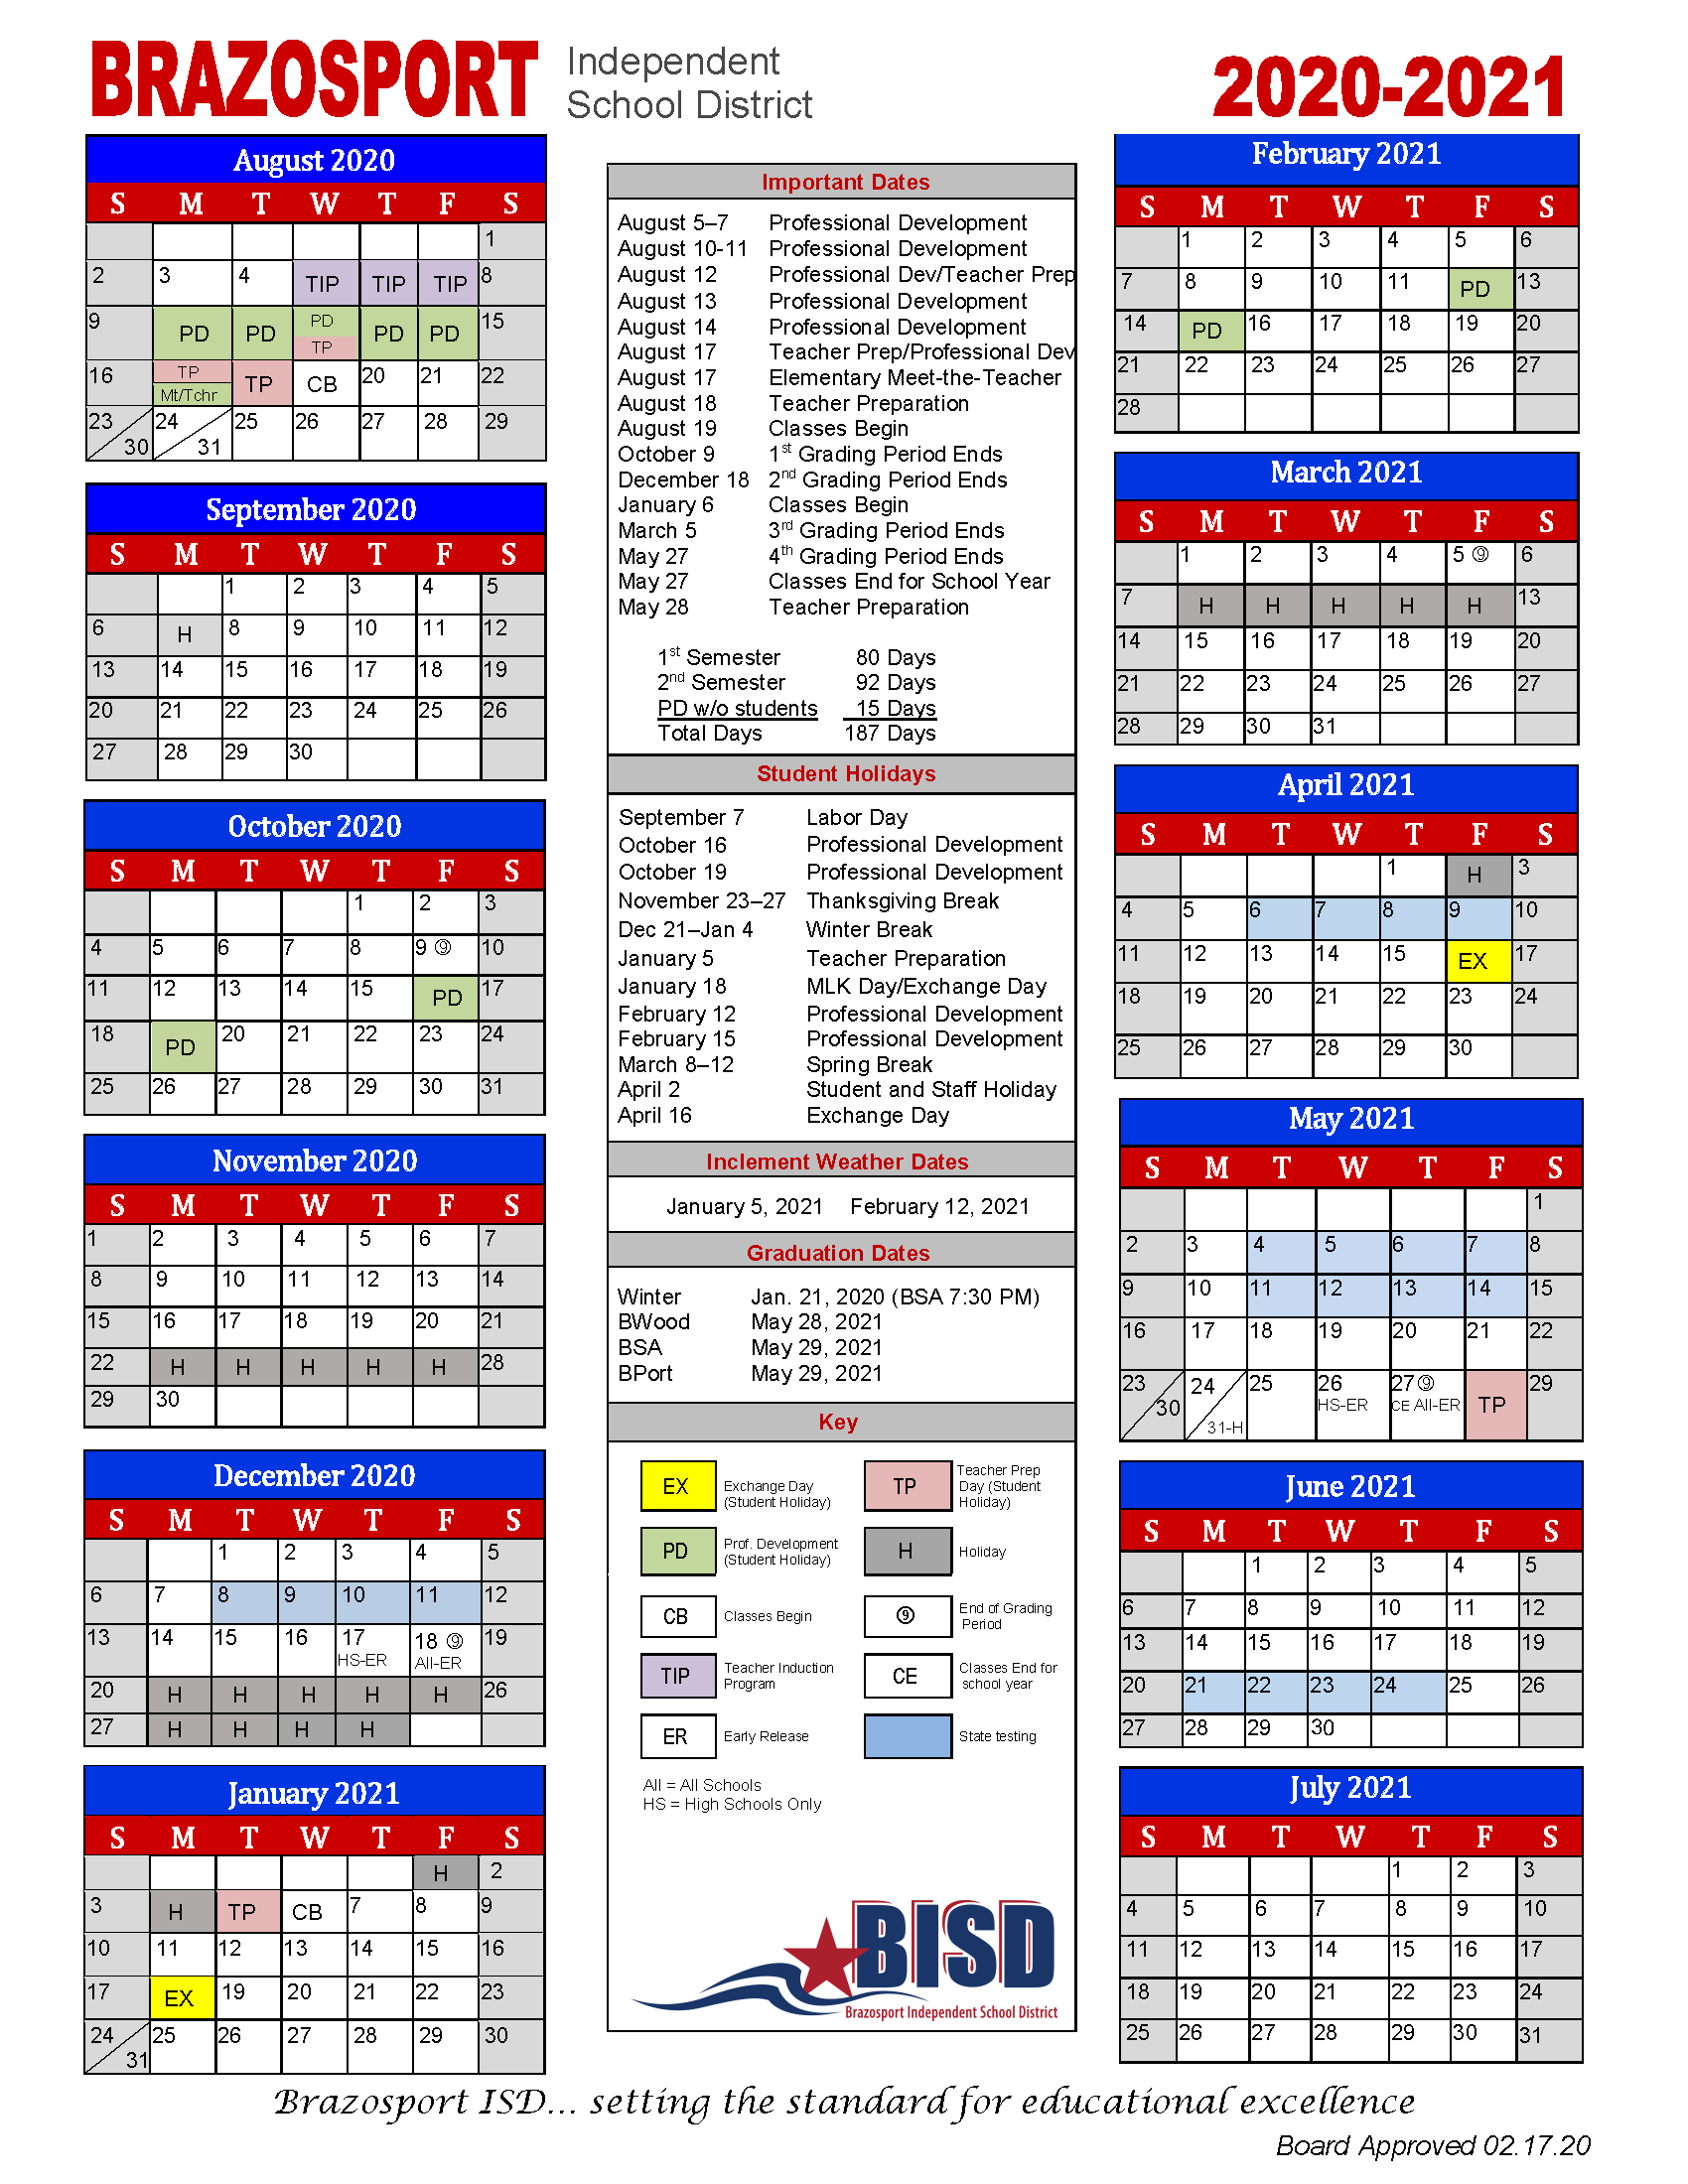 Board Approves 2020 2021 School Calendar - Brazosport Inside Brownsville Bisd School District Calendar